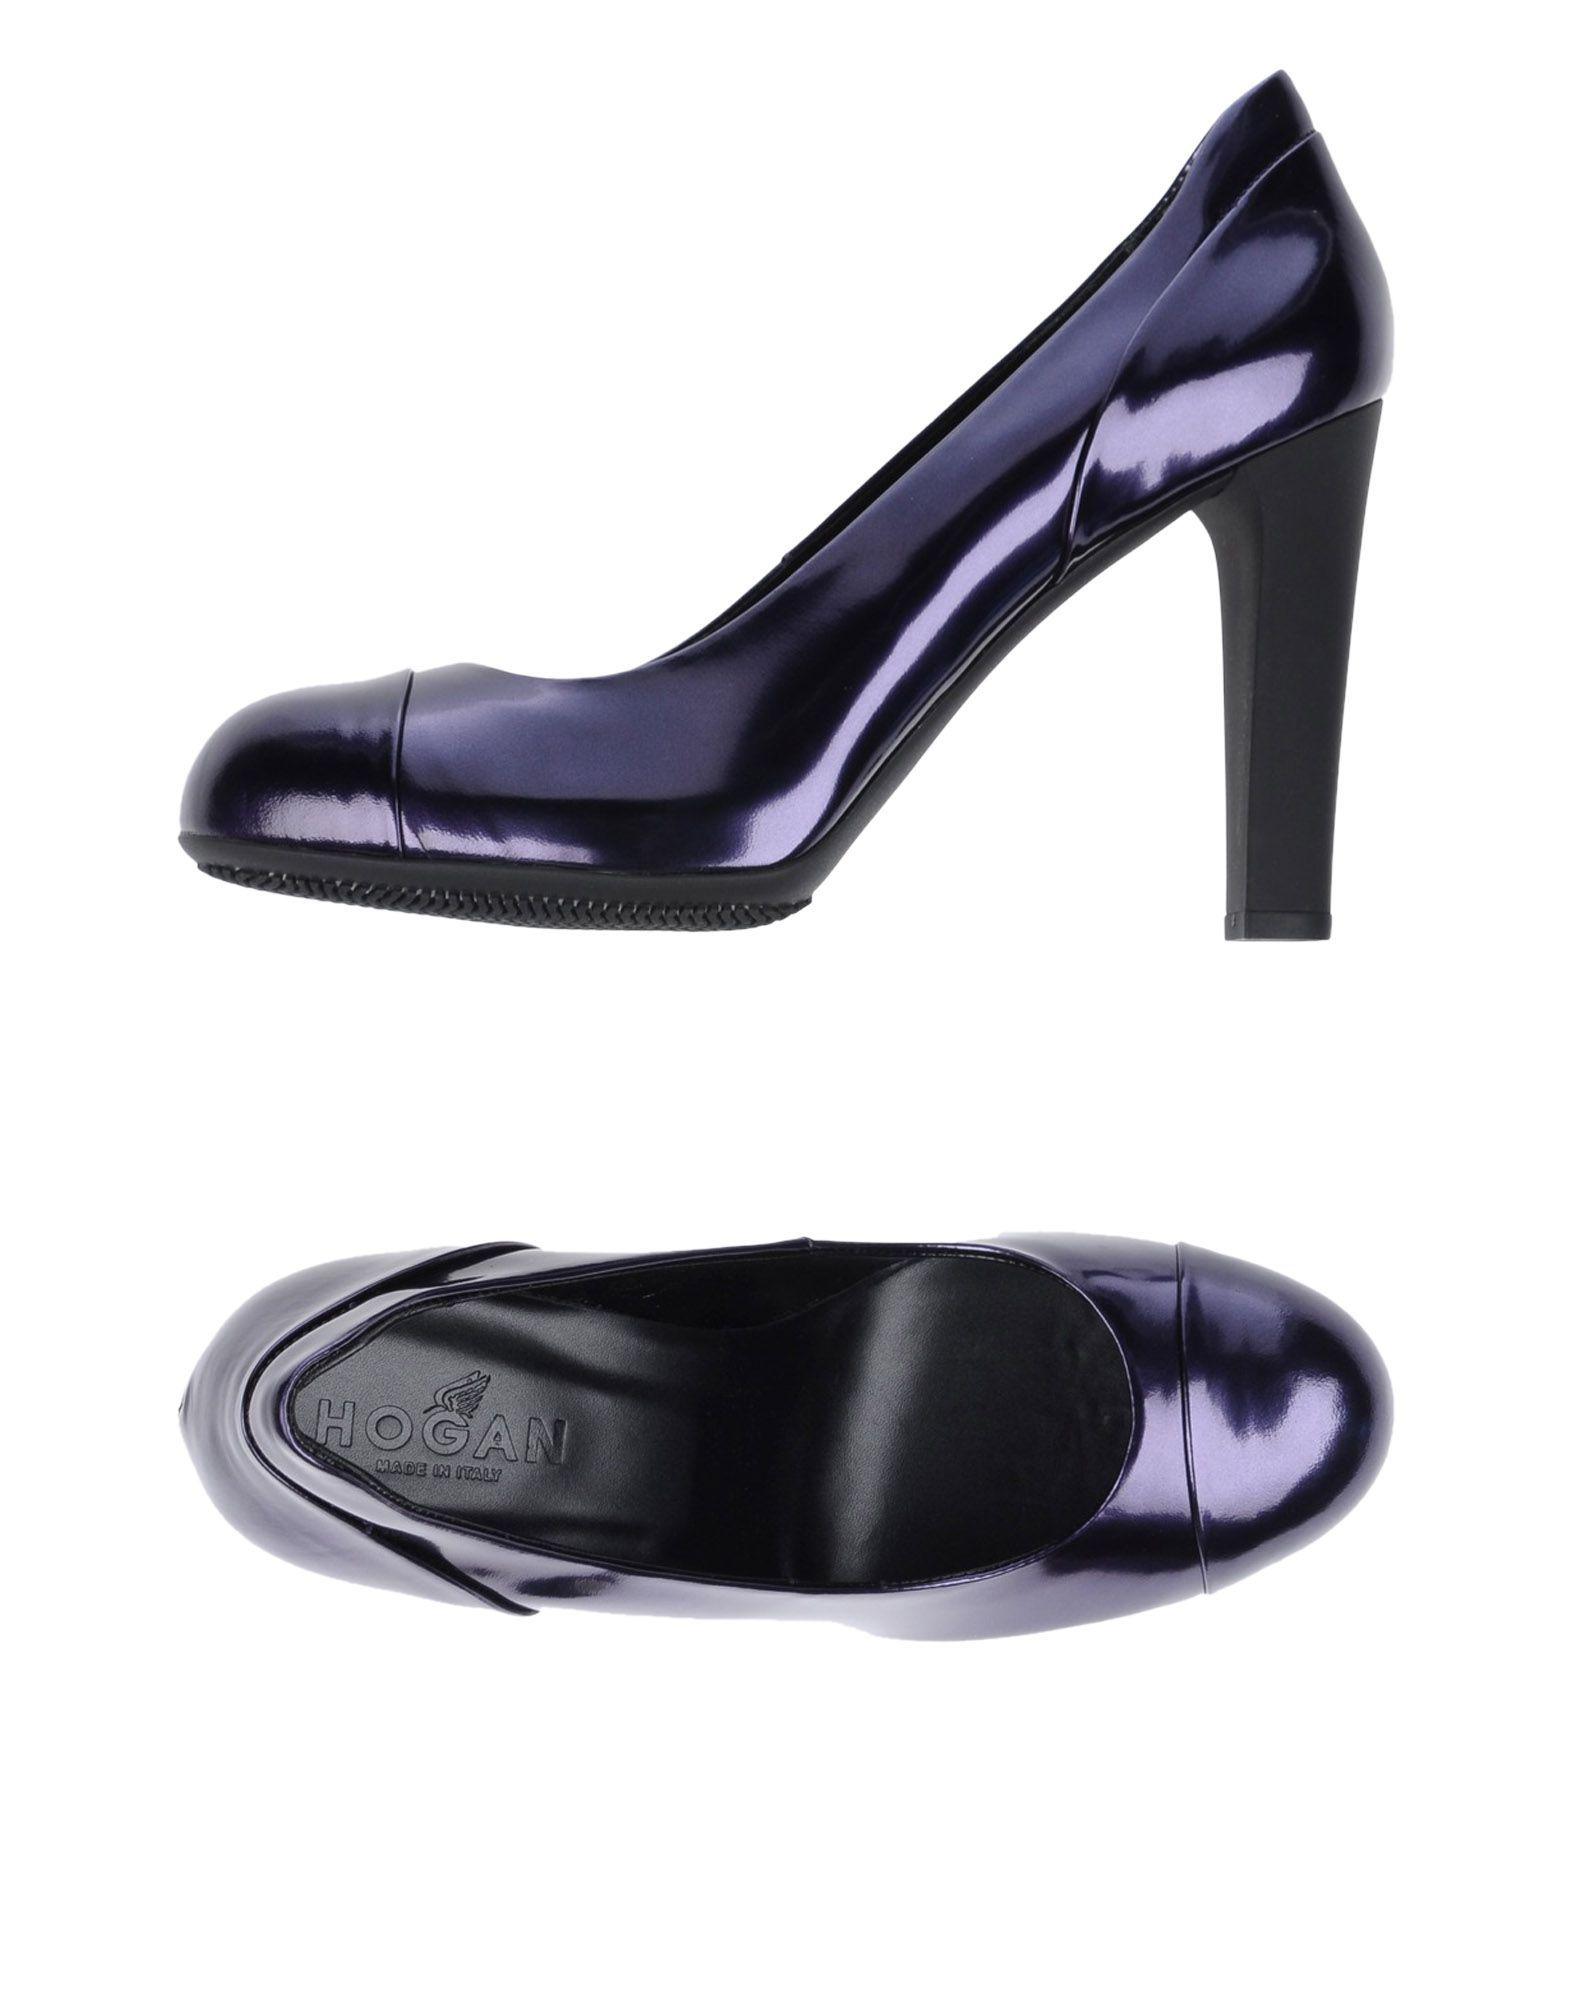 Hogan Purple Leather Court Shoe Heels